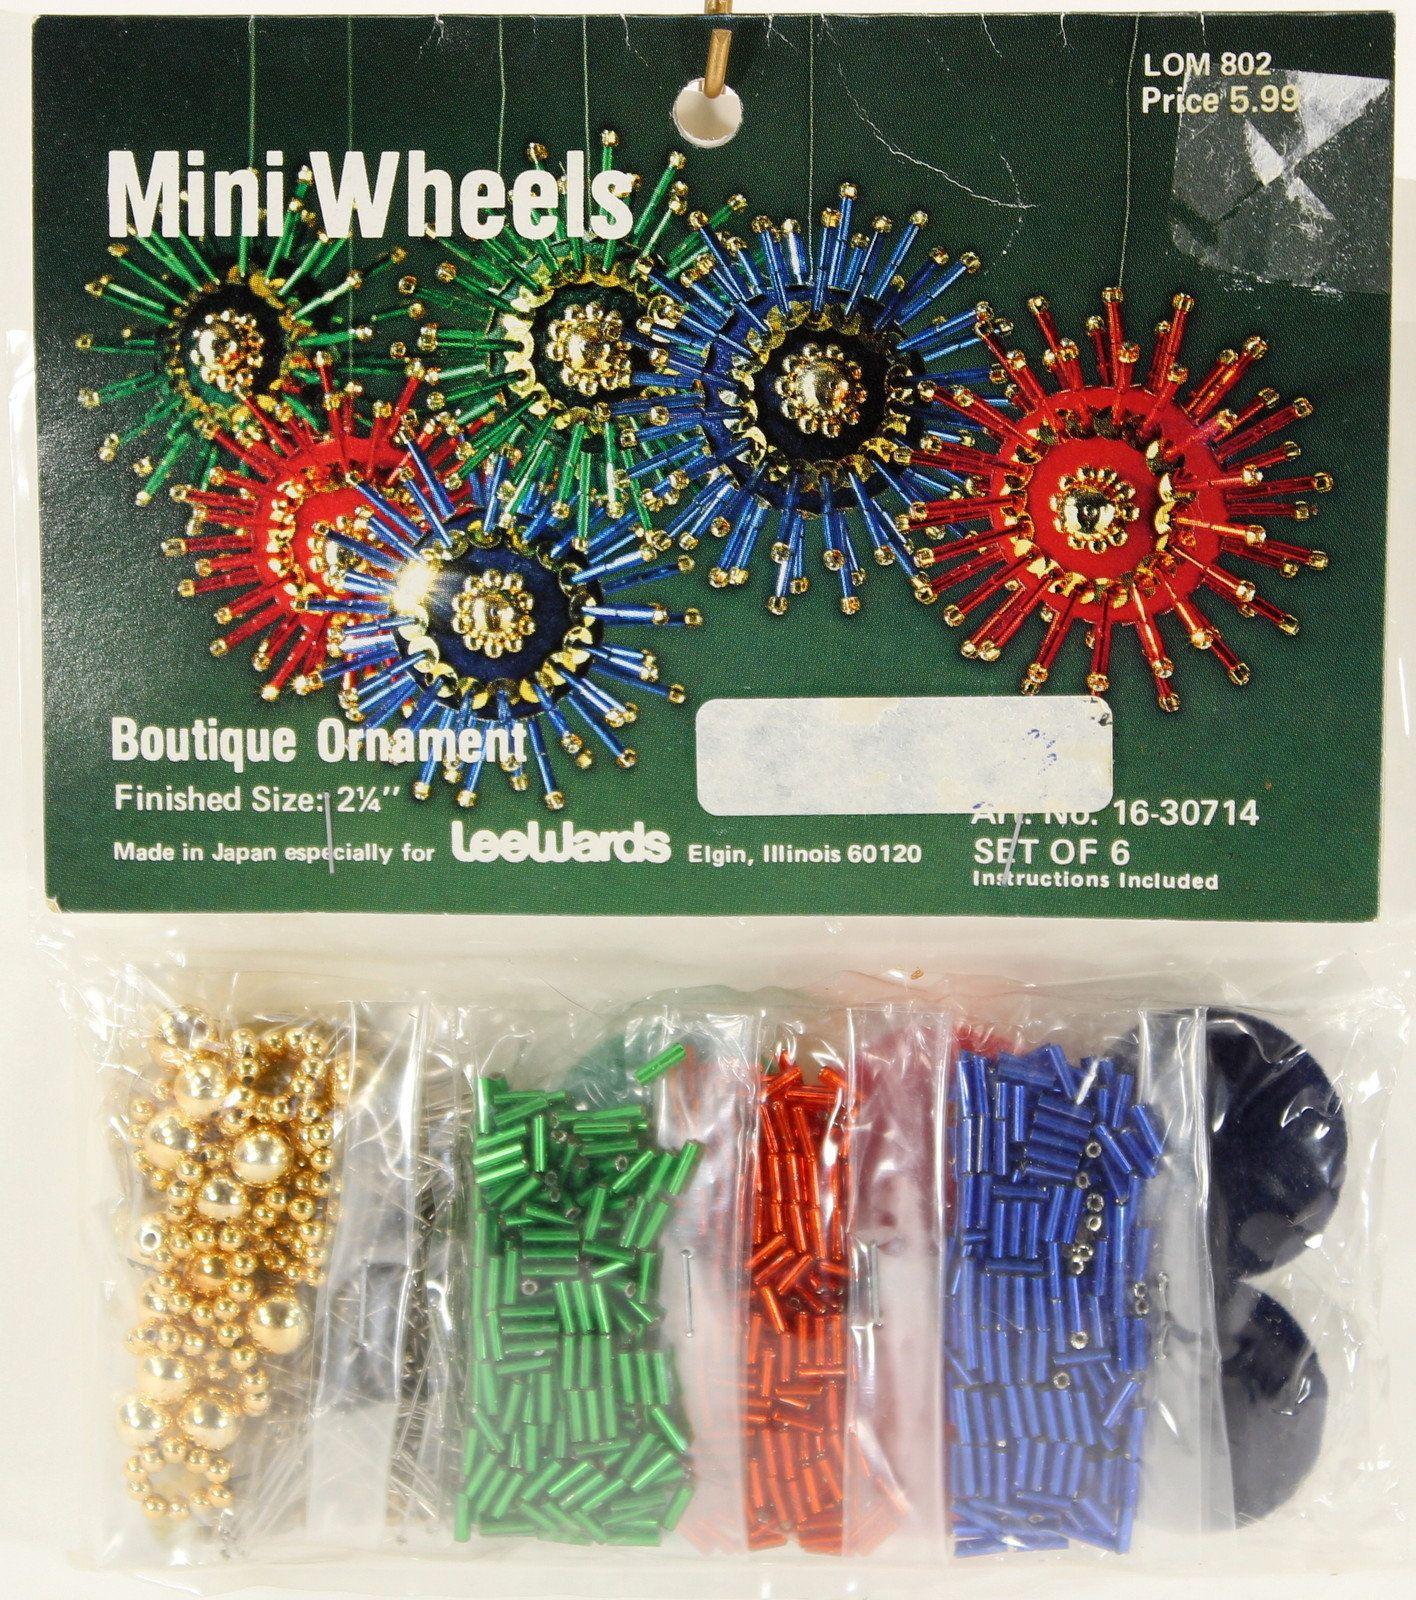 Lee Wards Mini Wheels Beaded Christmas Ornament Kit, Beads, Sequins